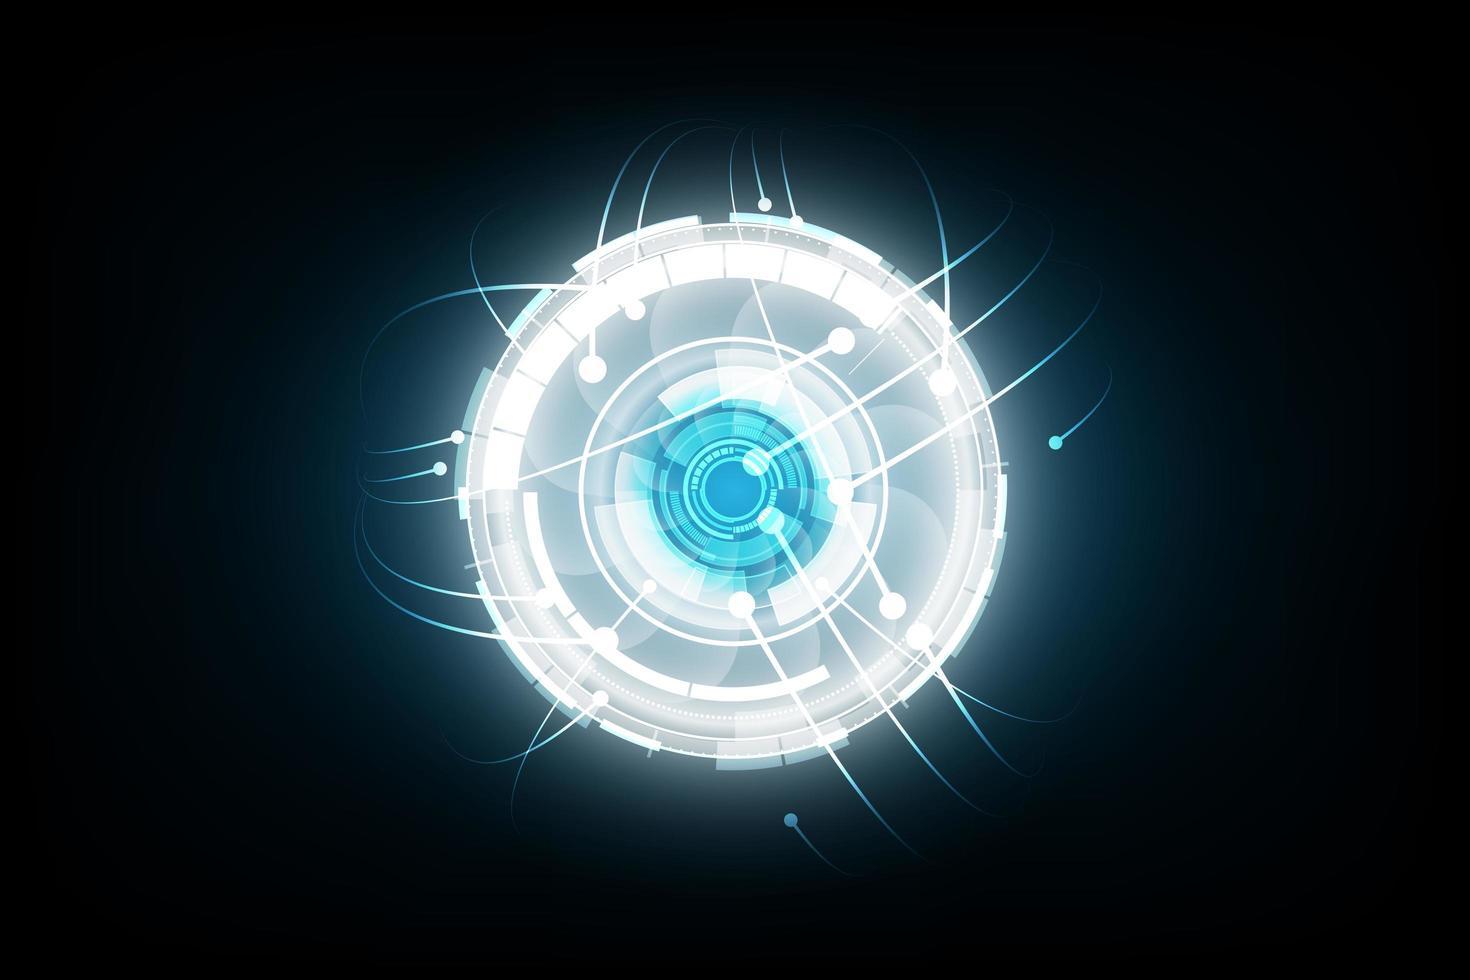 Fondo de concepto de tecnología abstracta, ilustración vectorial vector